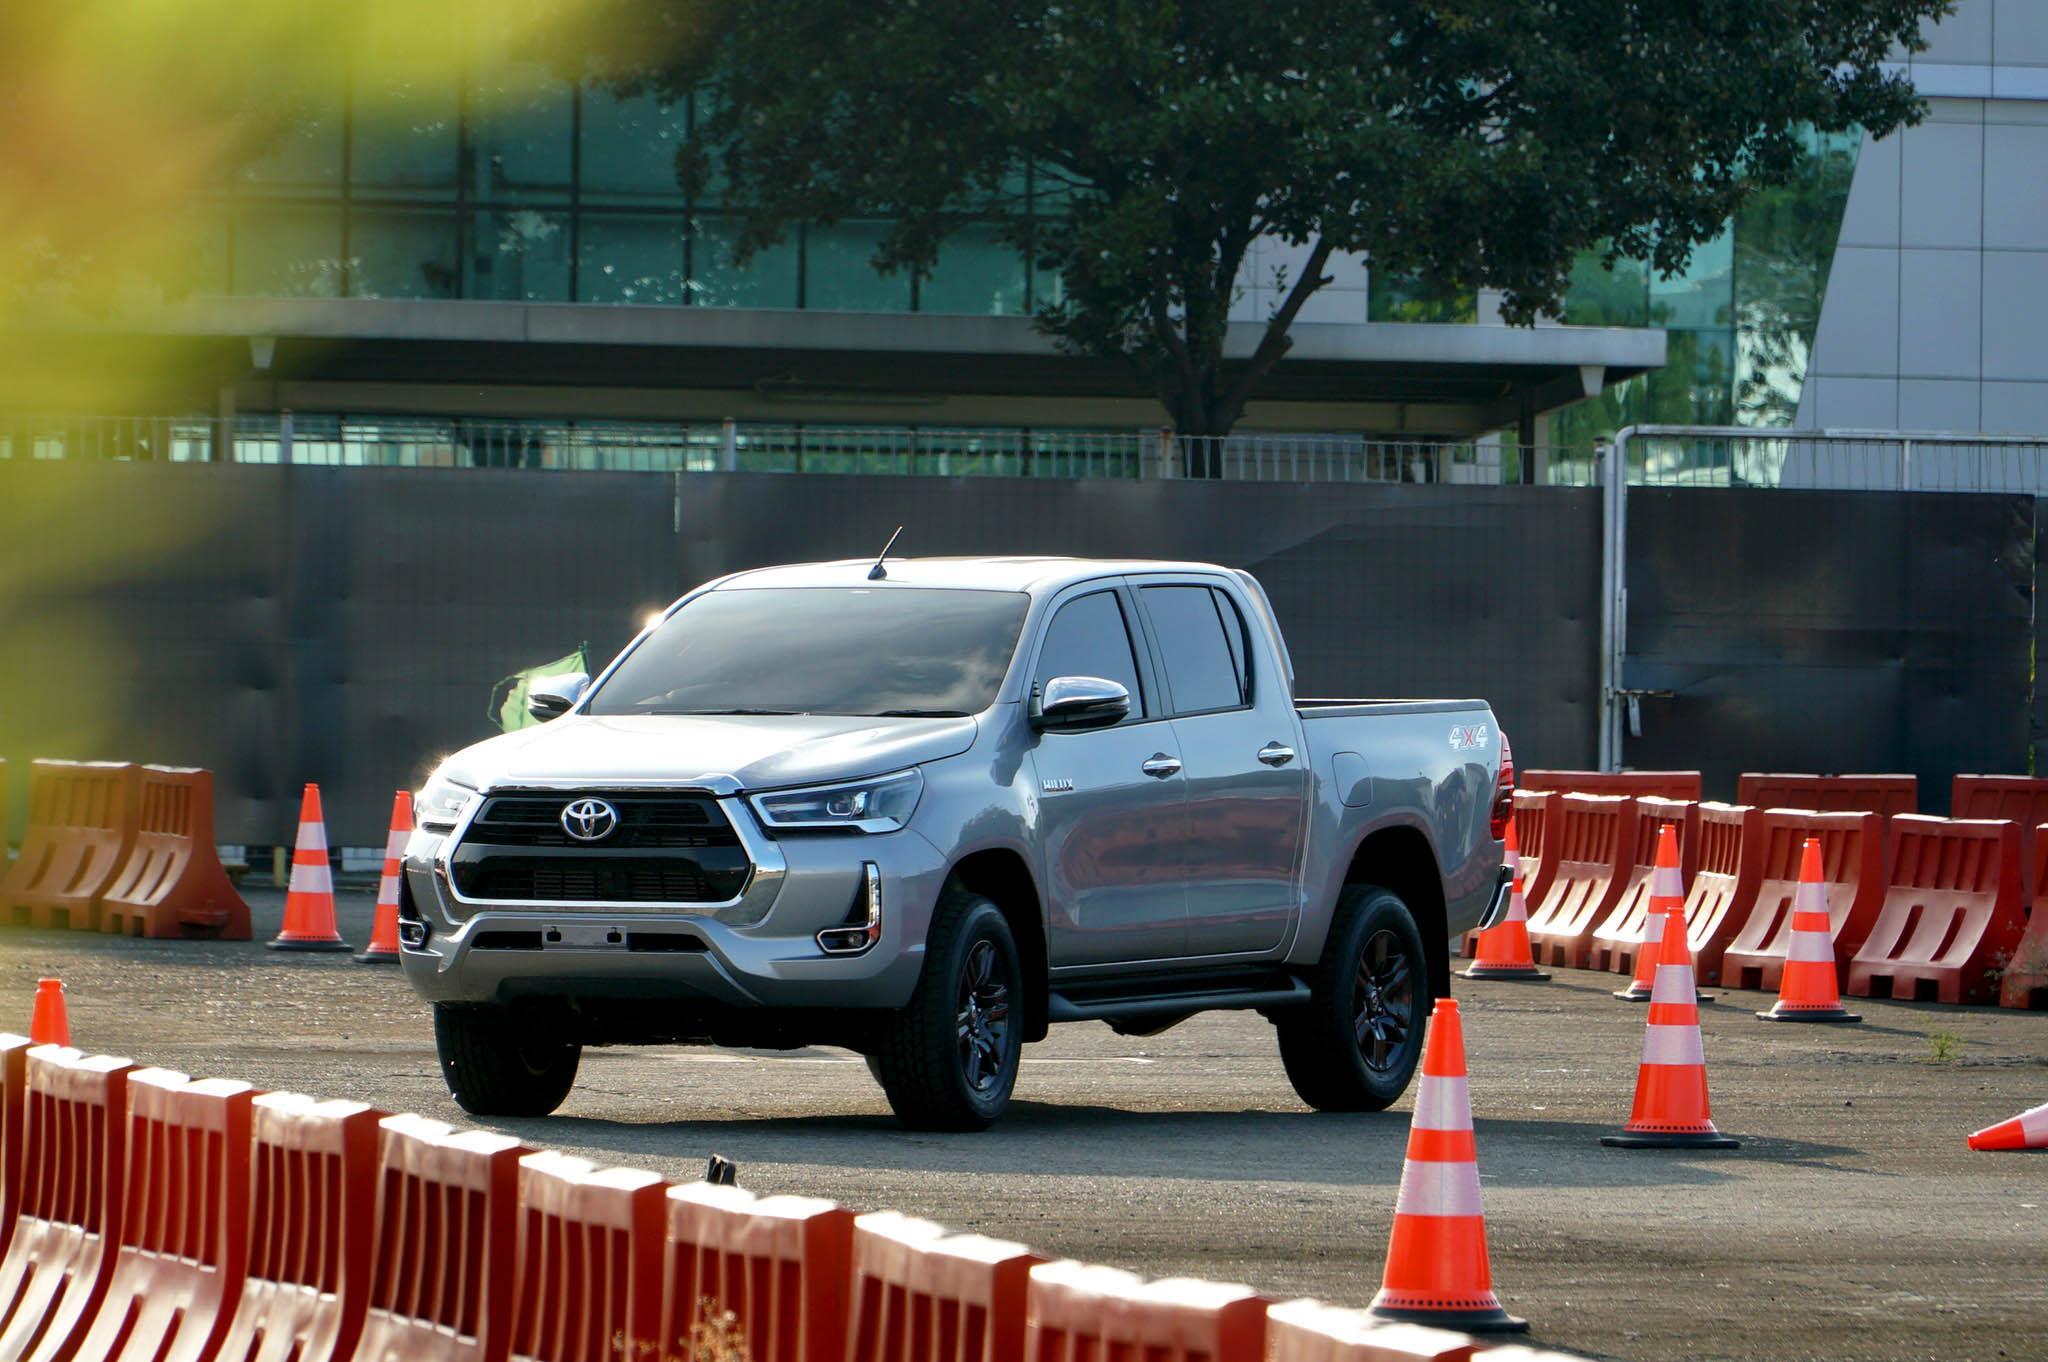 Kekurangan Harga Toyota Hilux 2019 Tangguh